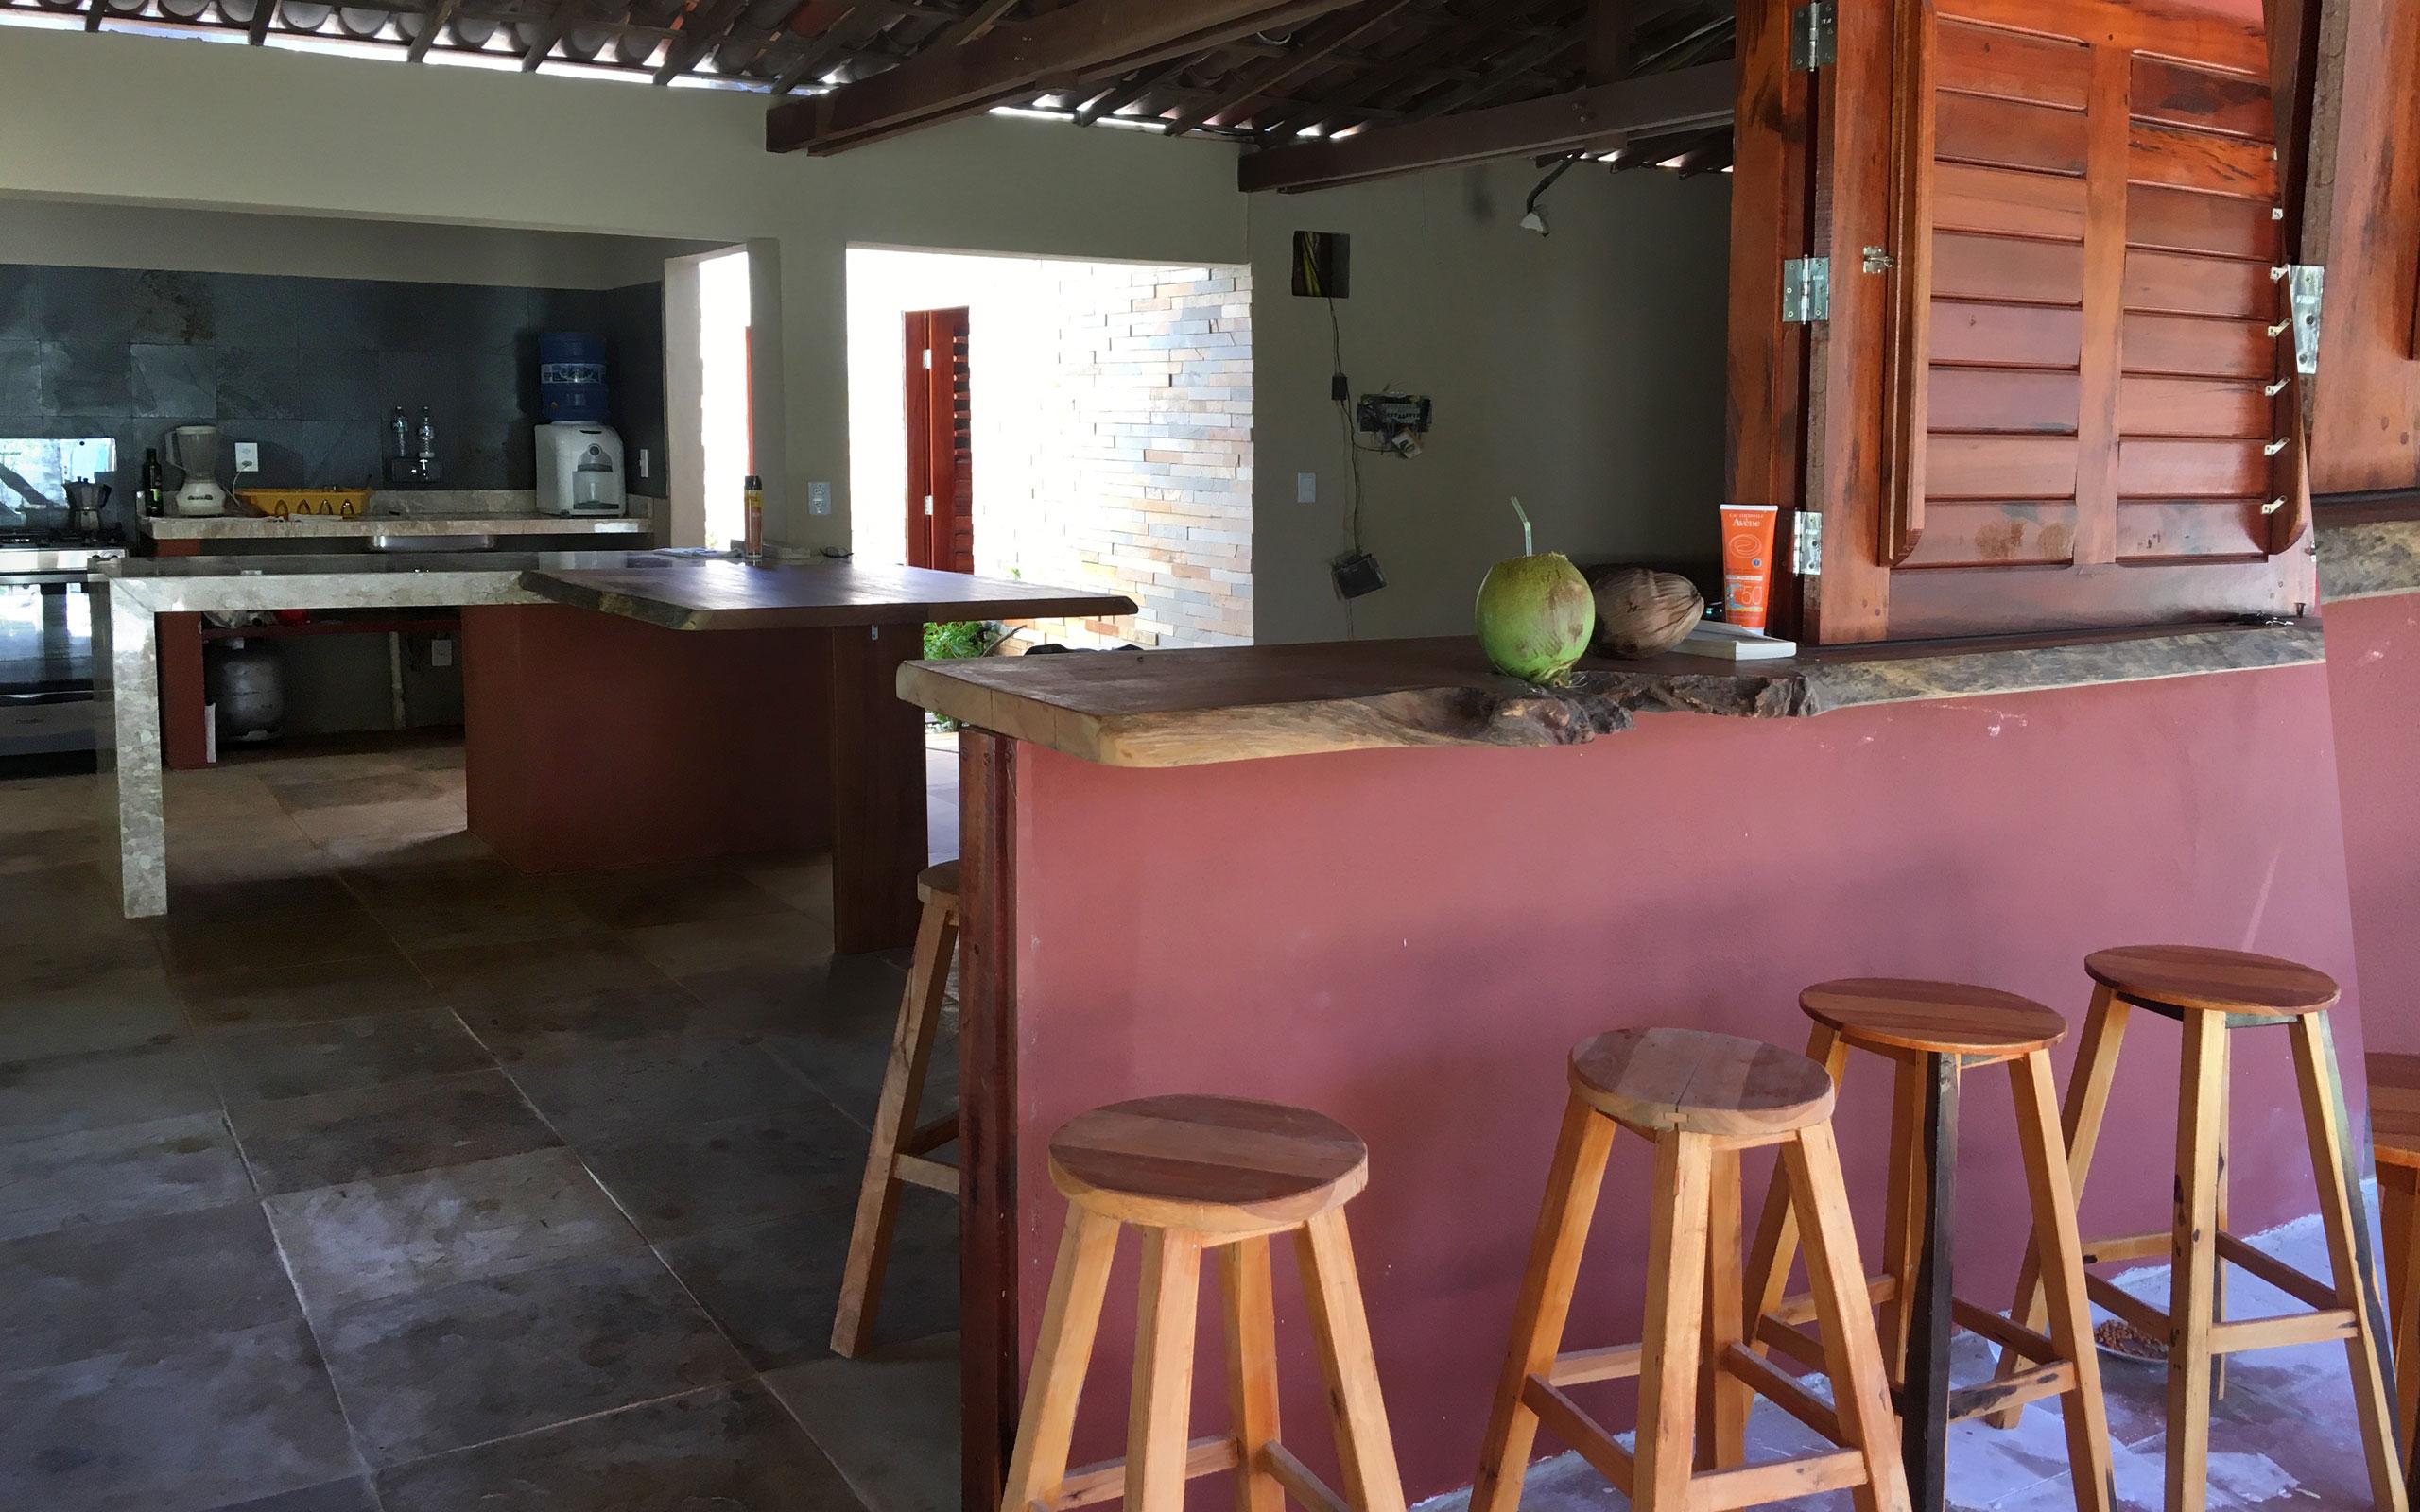 vilakapa-parajuru-bresil-maison-vila-kapa-cuisine-03a-2560